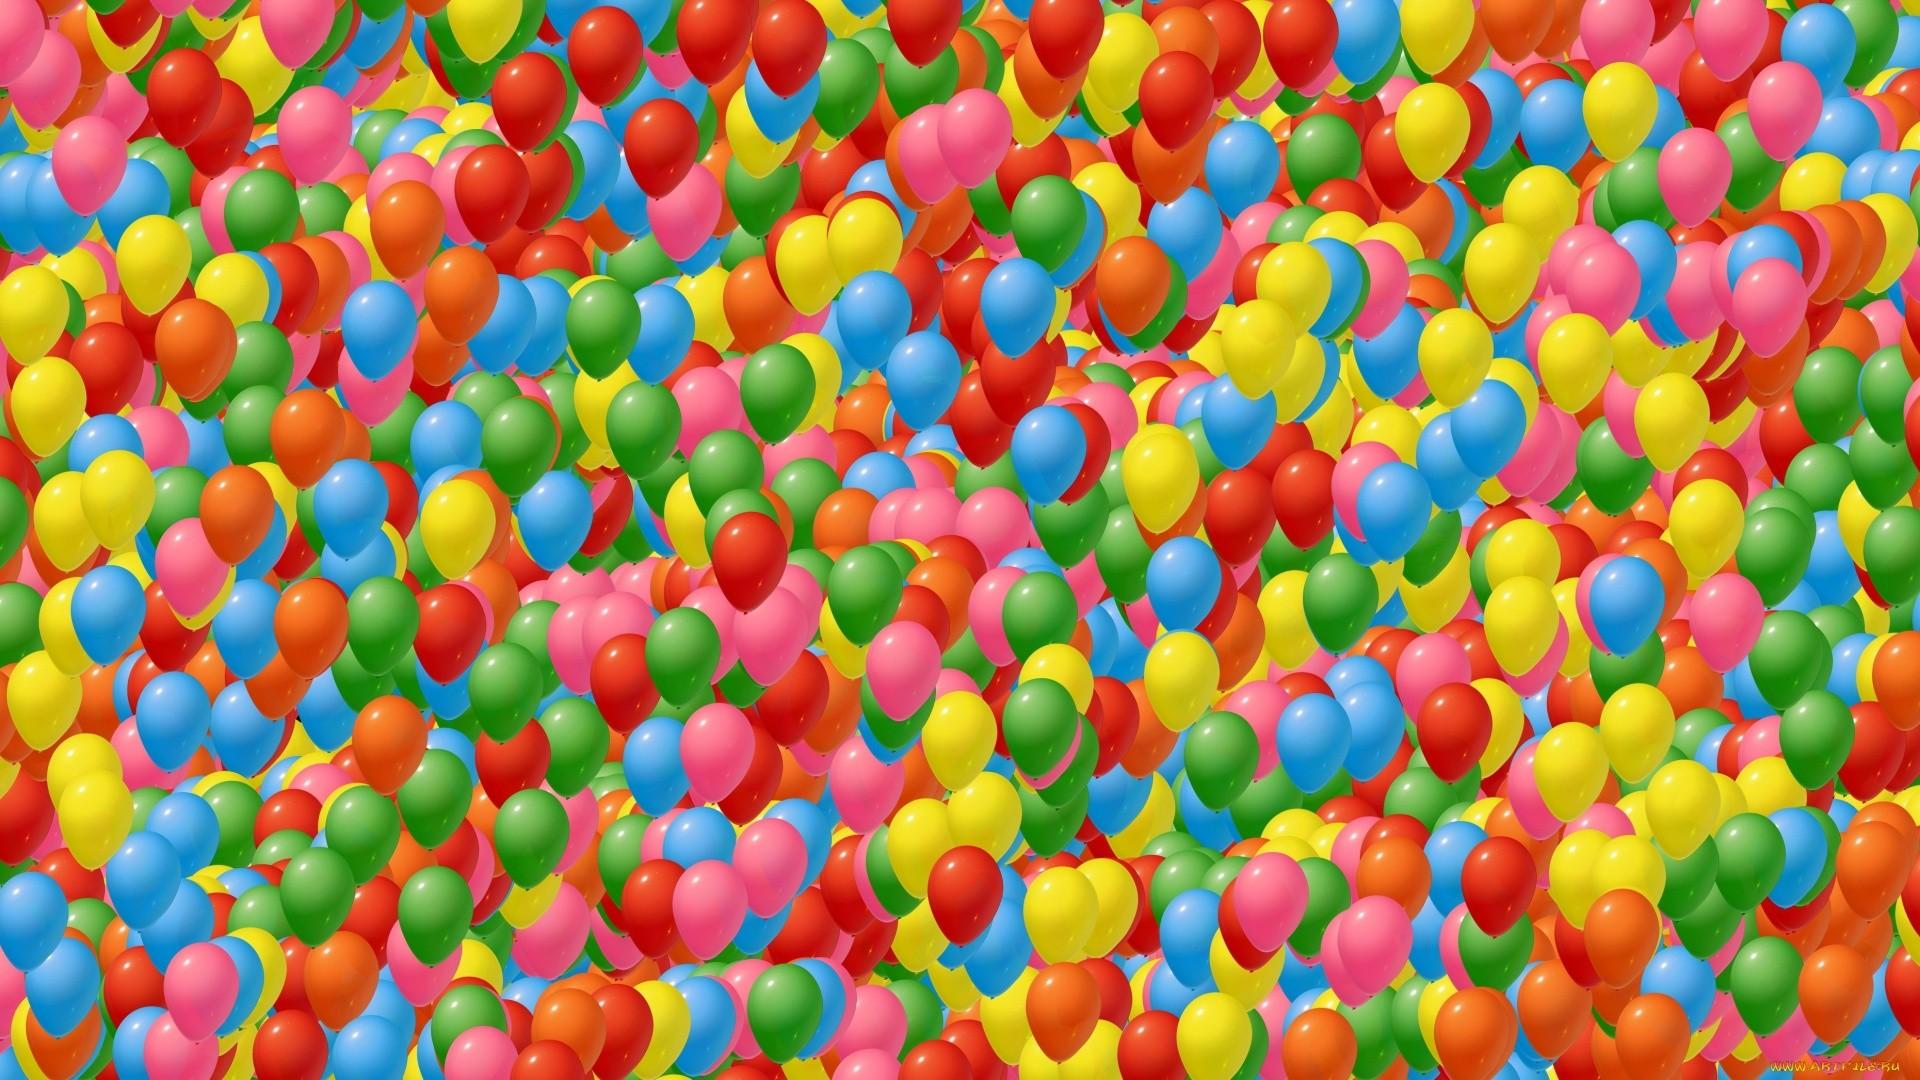 Balloon wallpaper photo hd